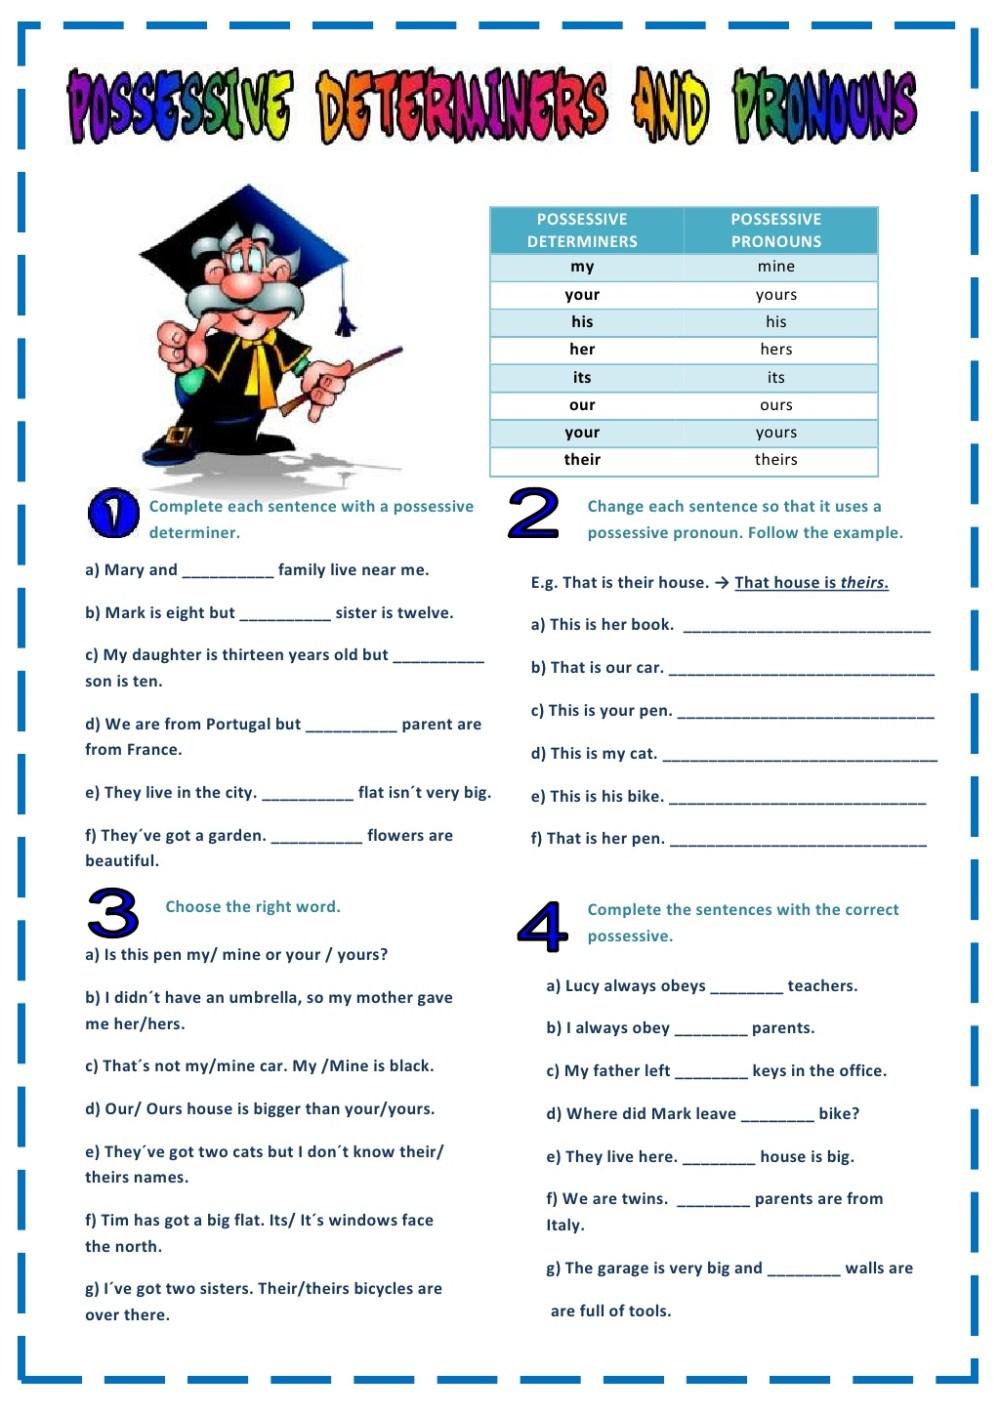 medium resolution of possessive pronouns exercises - beall blog